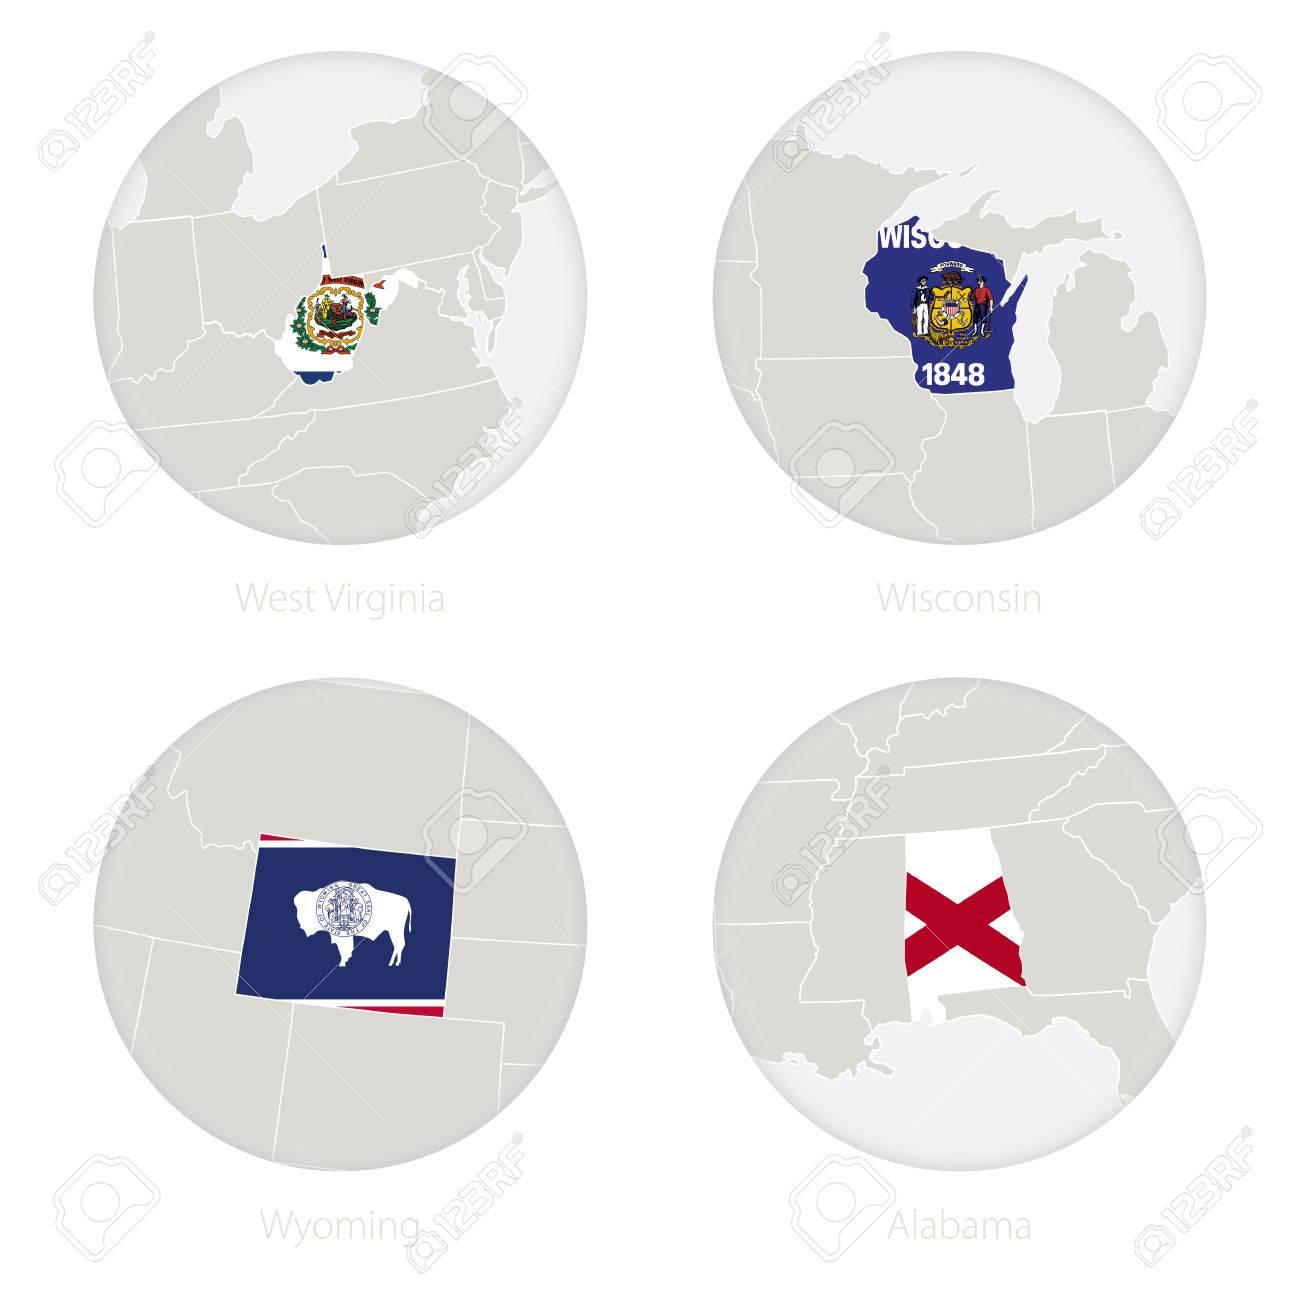 Us Map Wyoming - Wyoming in us map